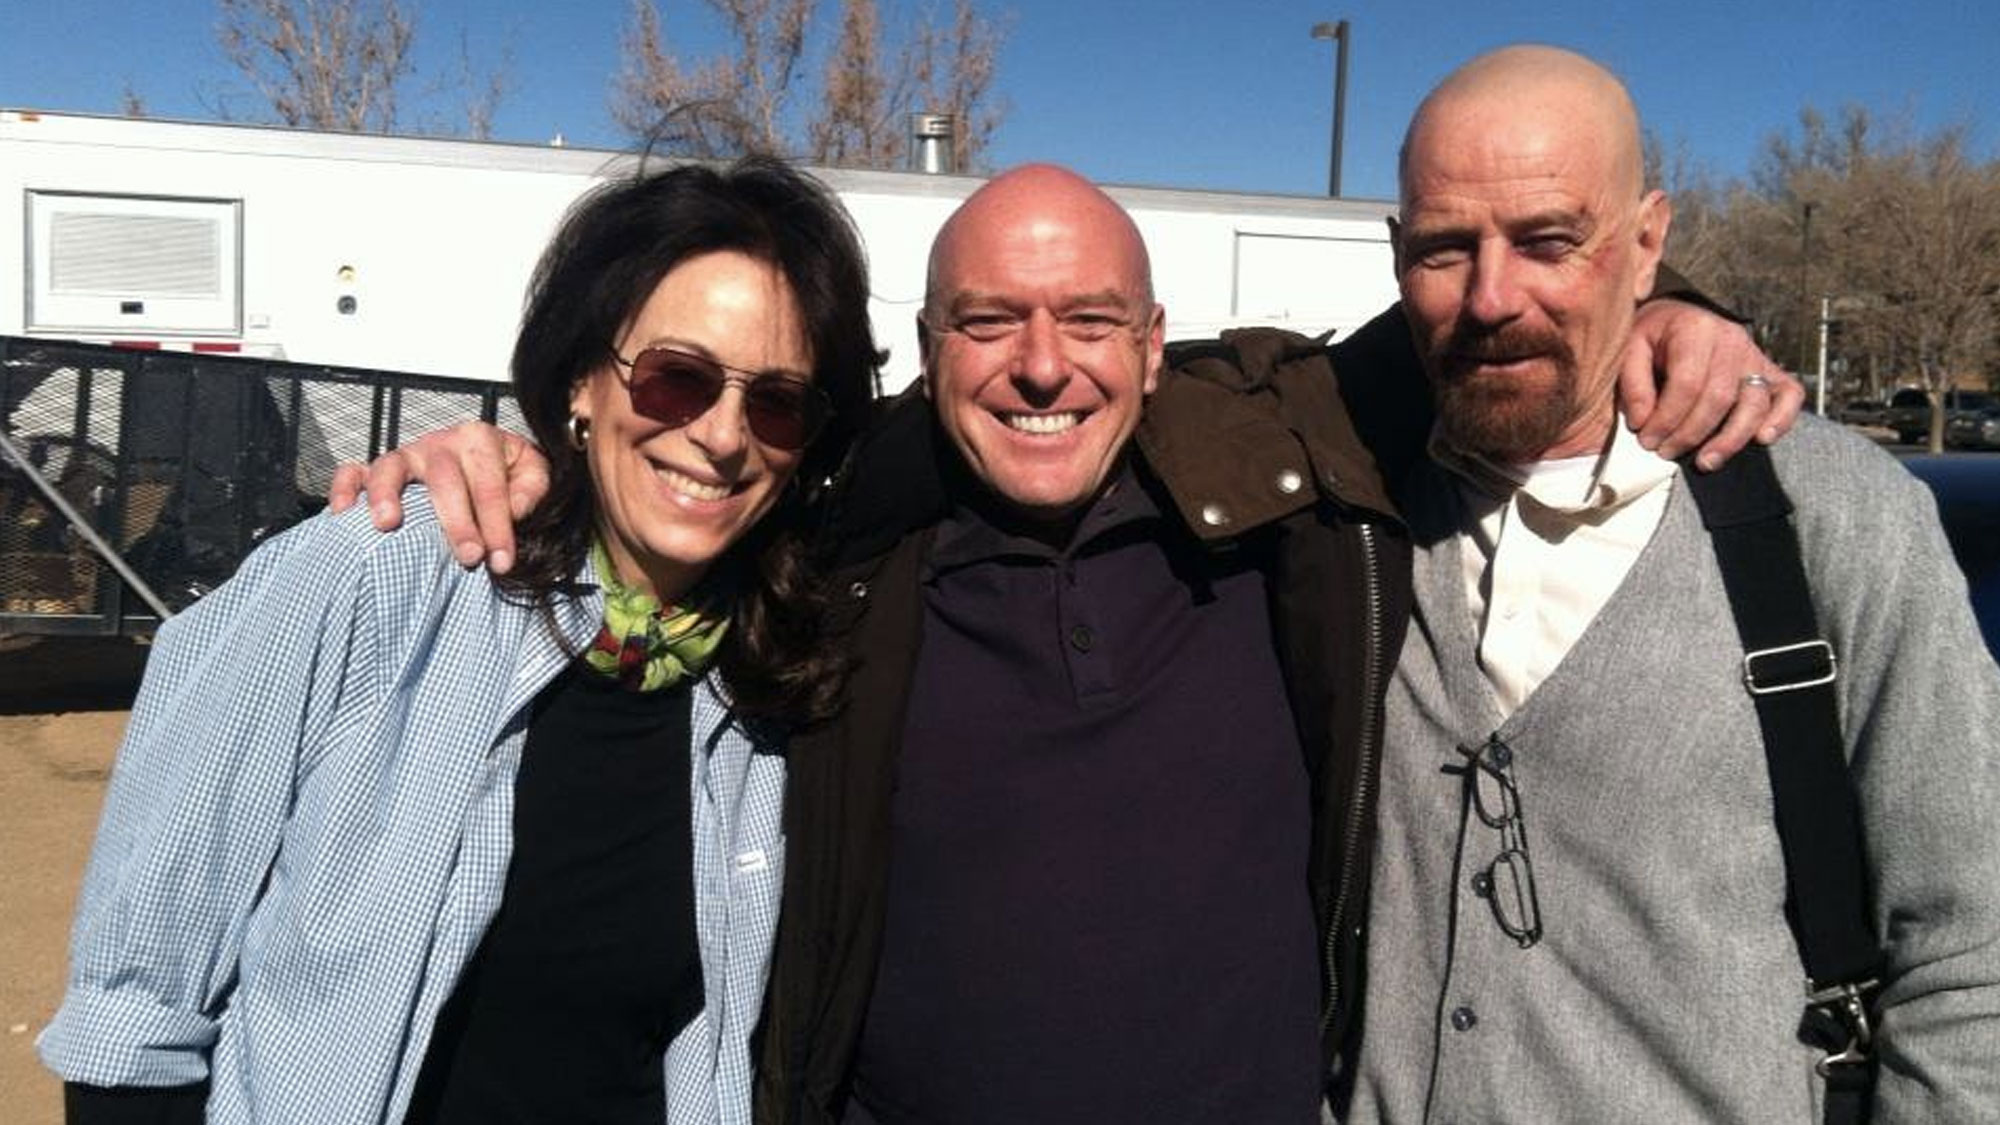 Jane Kaczmarek, Dean Norris et Bryan Cranston.